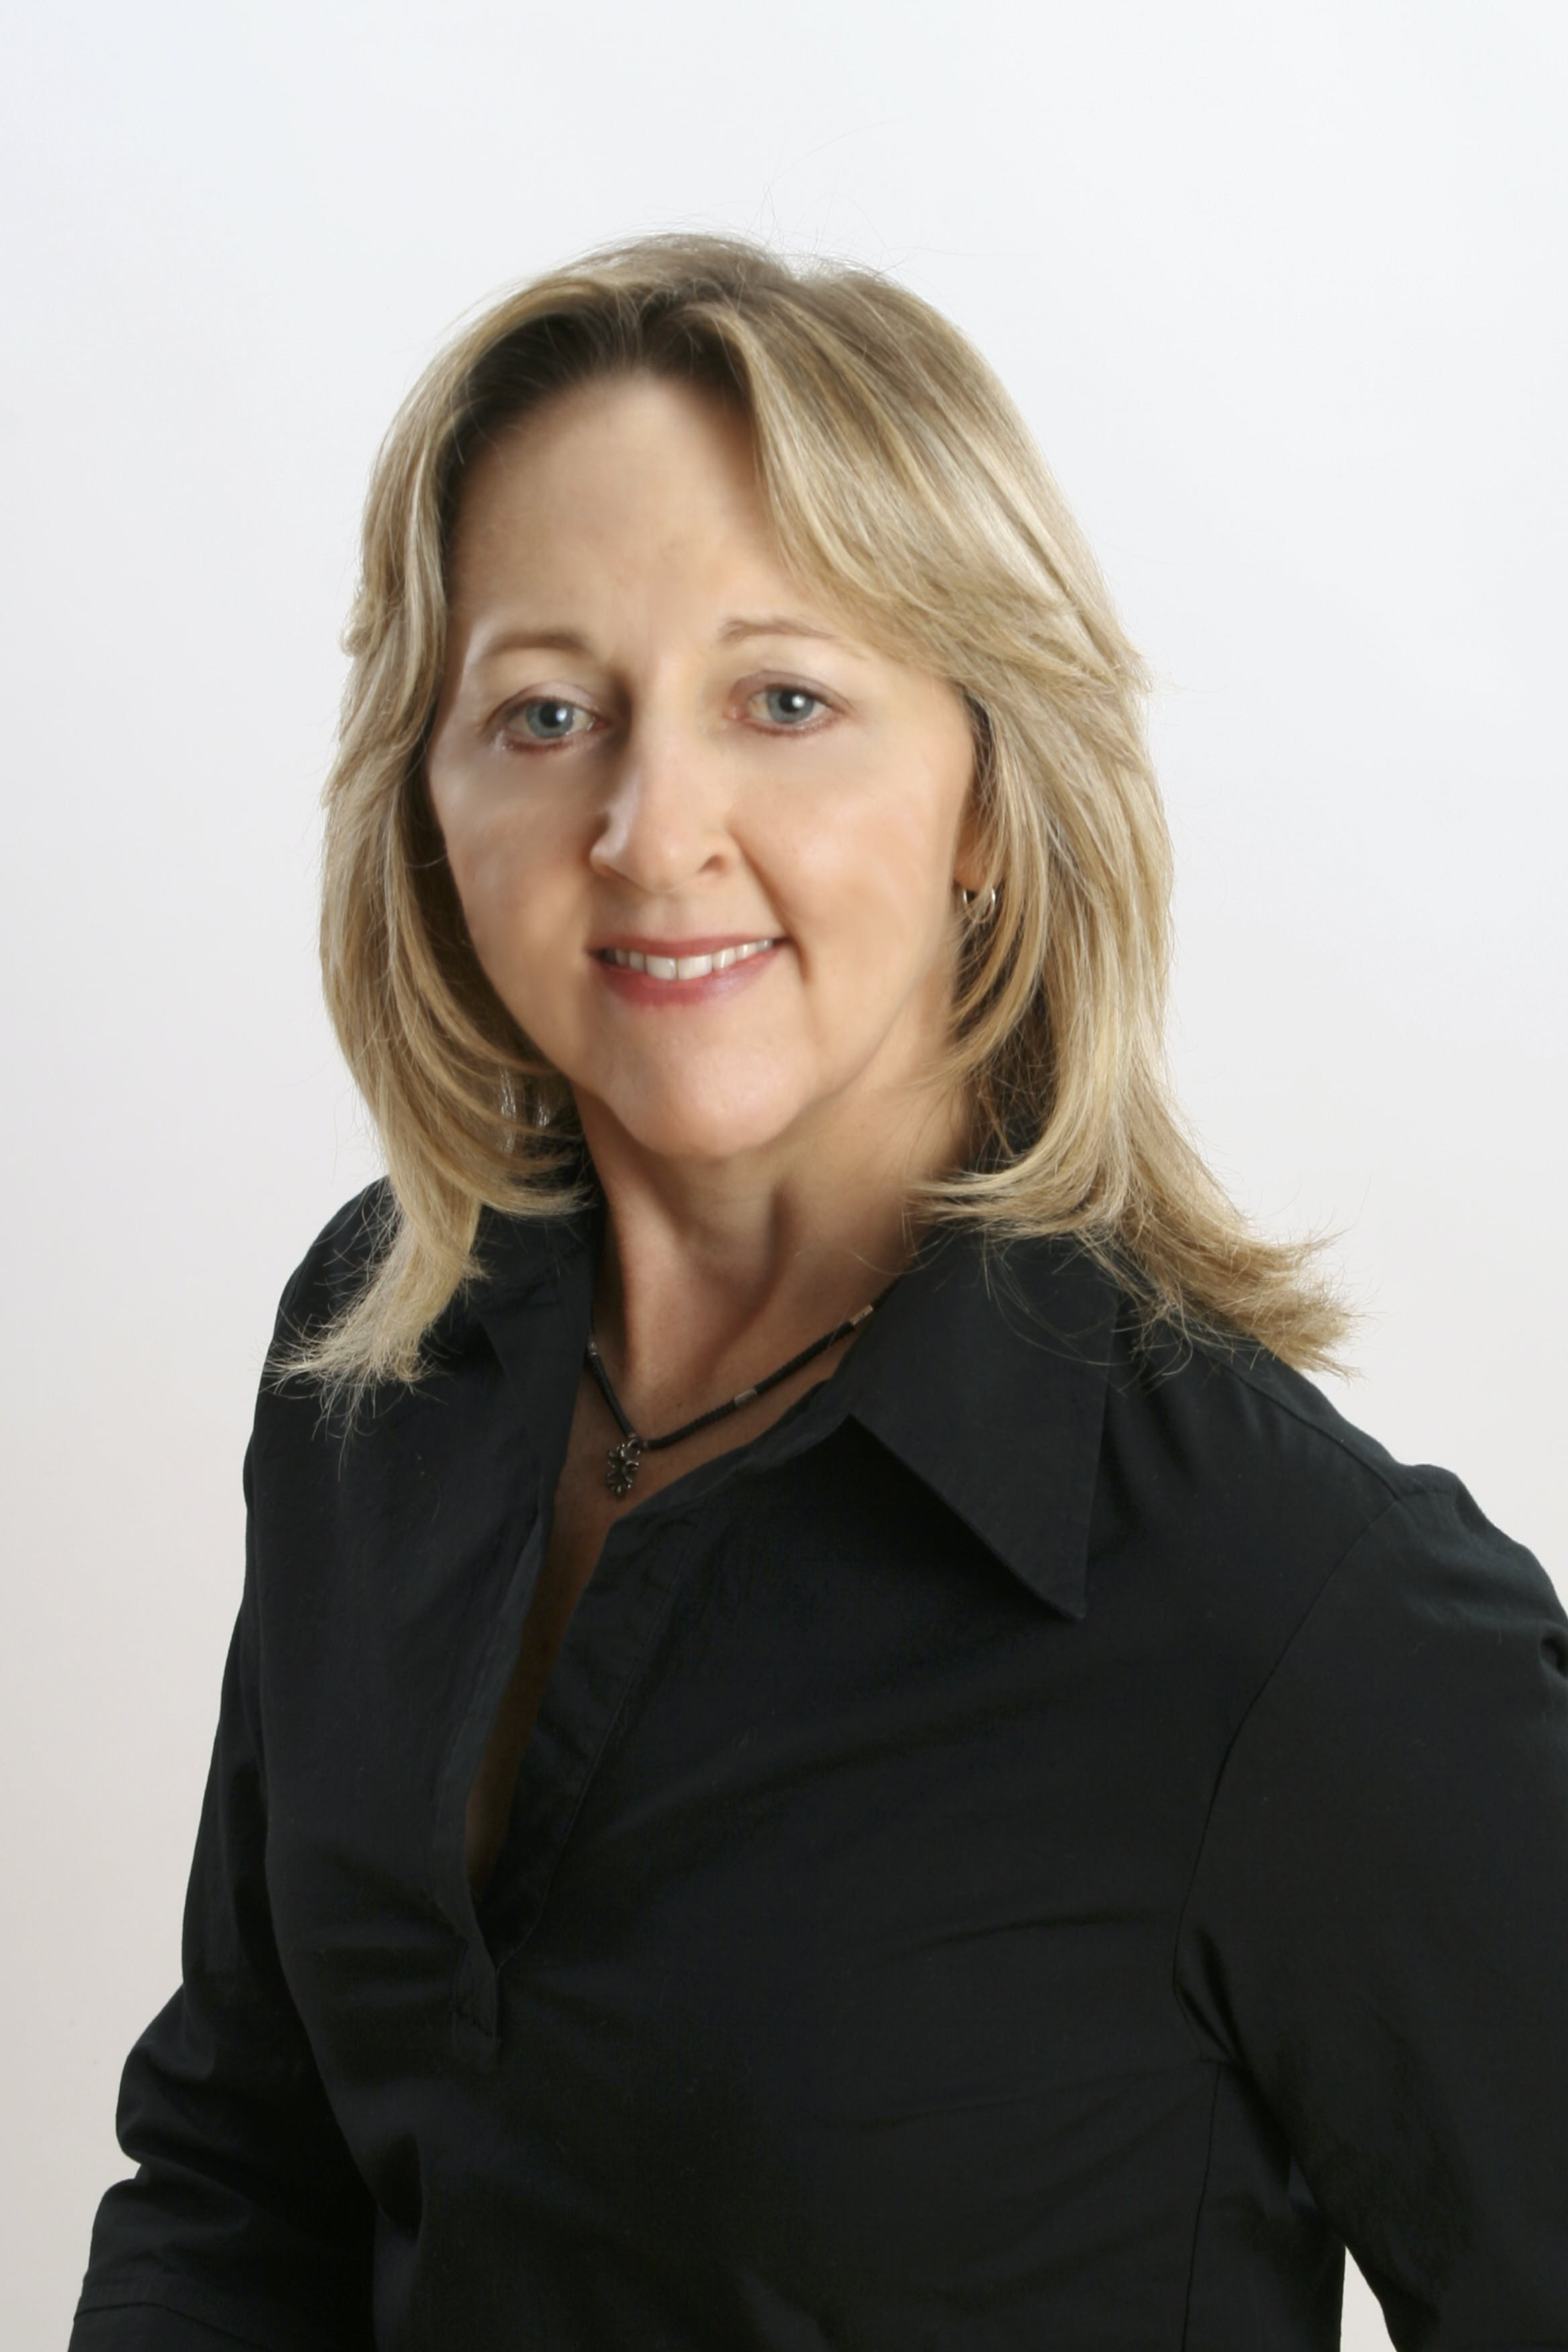 Jeanne Coleman